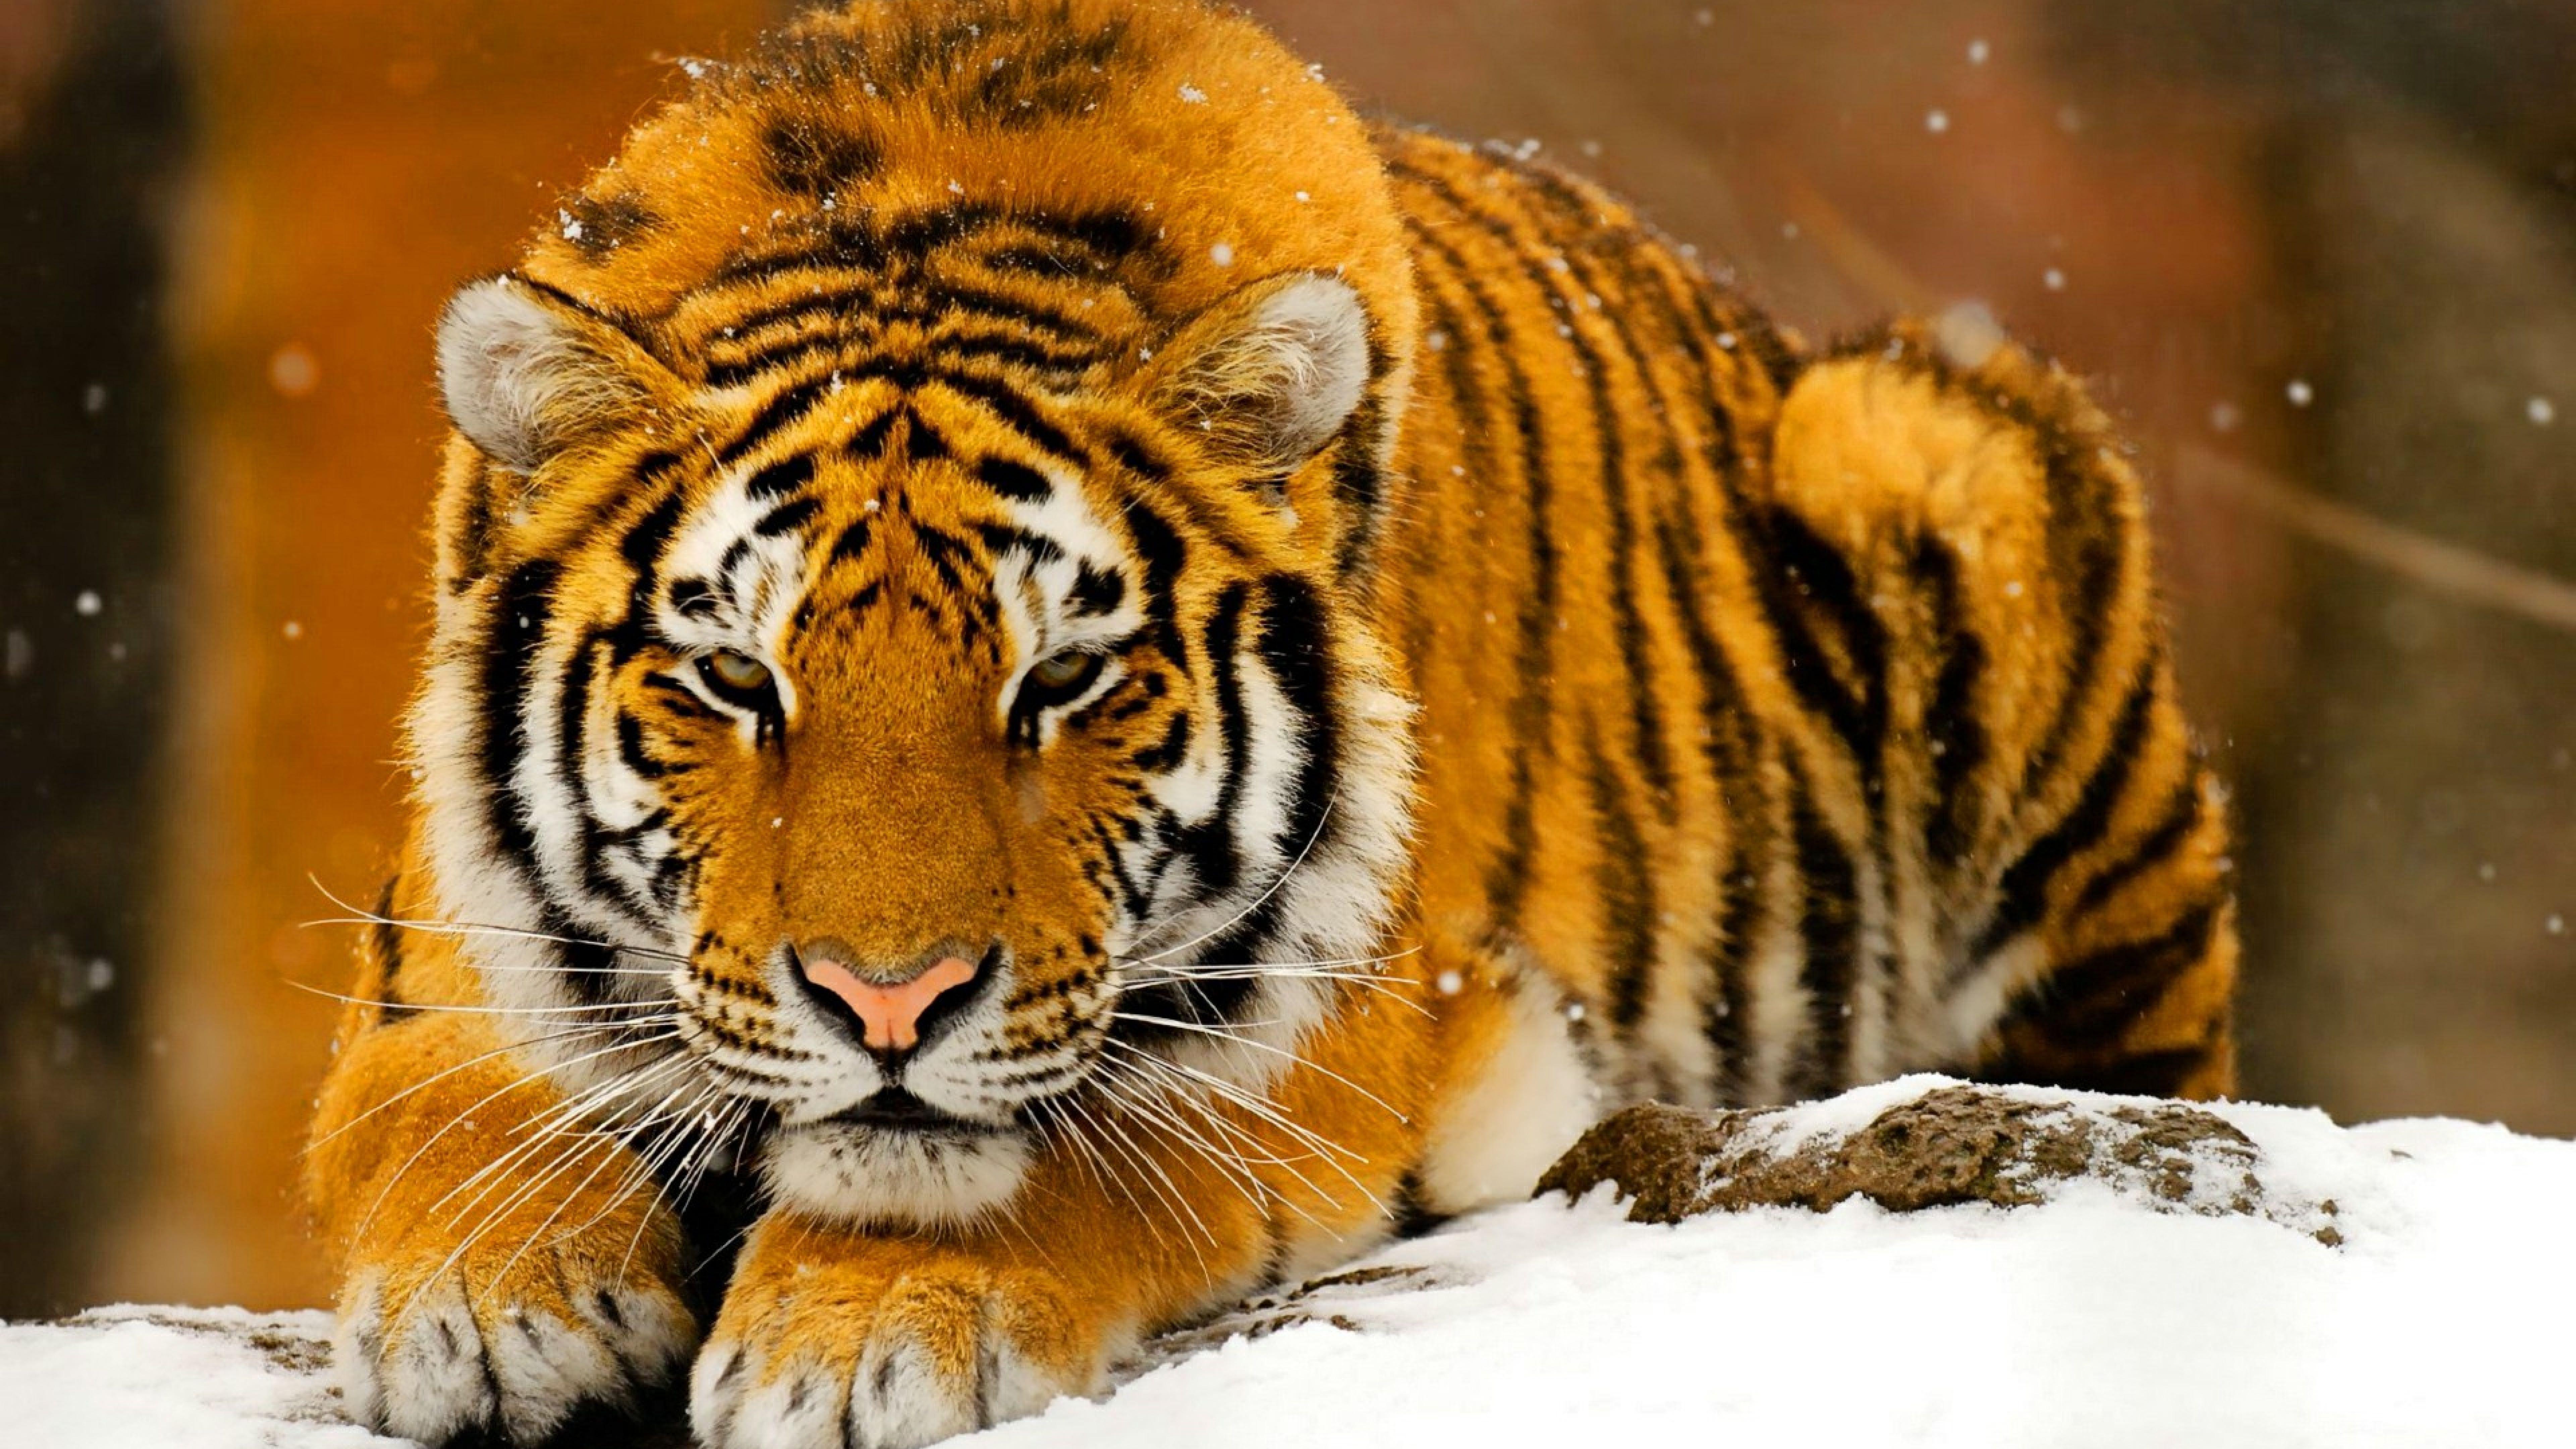 8k Ultra Hd Animal Wallpapers Top Free 8k Ultra Hd Animal